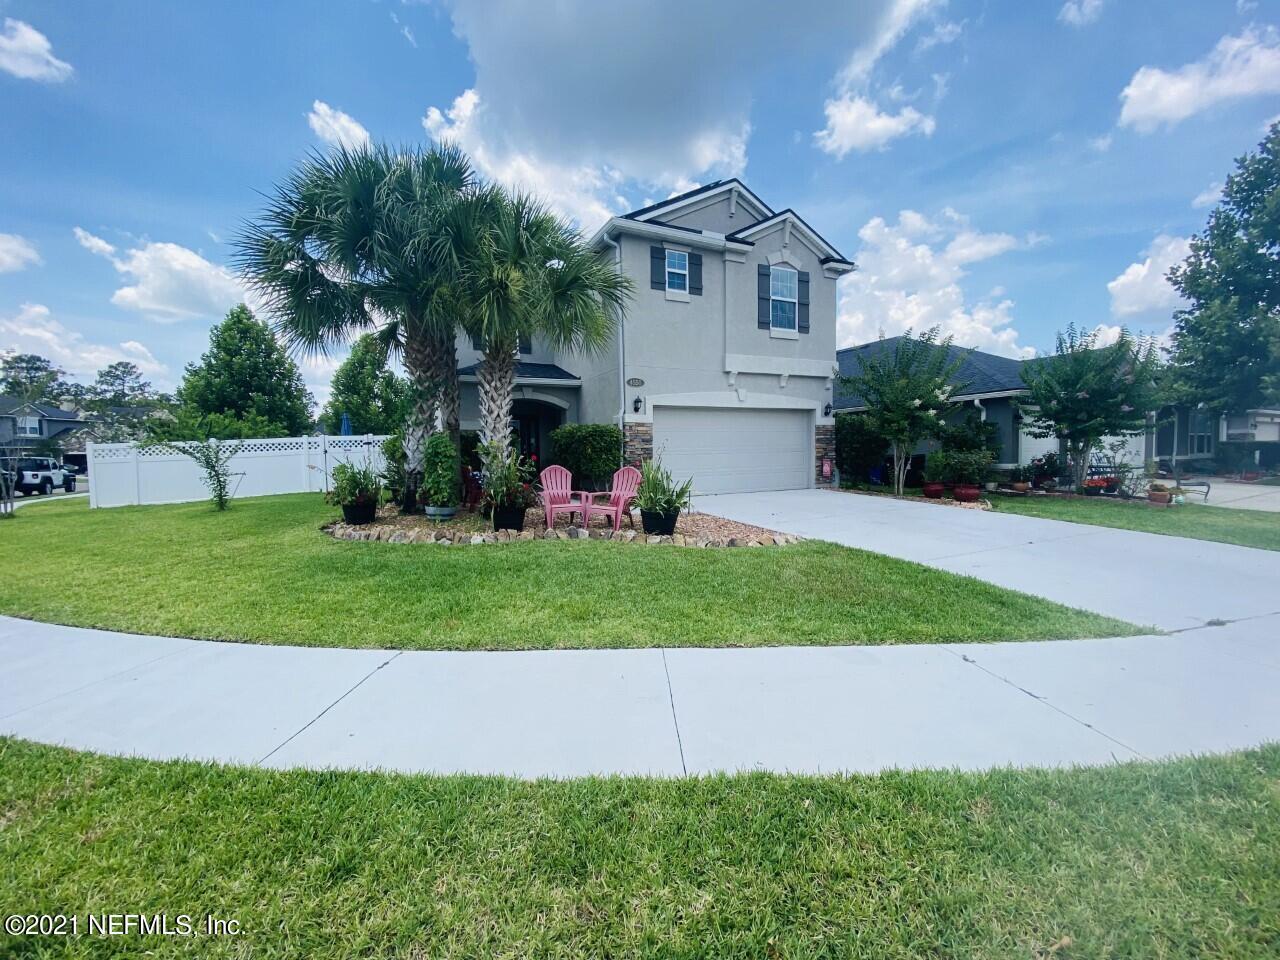 4550 PLANTATION OAKS, ORANGE PARK, FLORIDA 32065, 4 Bedrooms Bedrooms, ,2 BathroomsBathrooms,Residential,For sale,PLANTATION OAKS,1115477